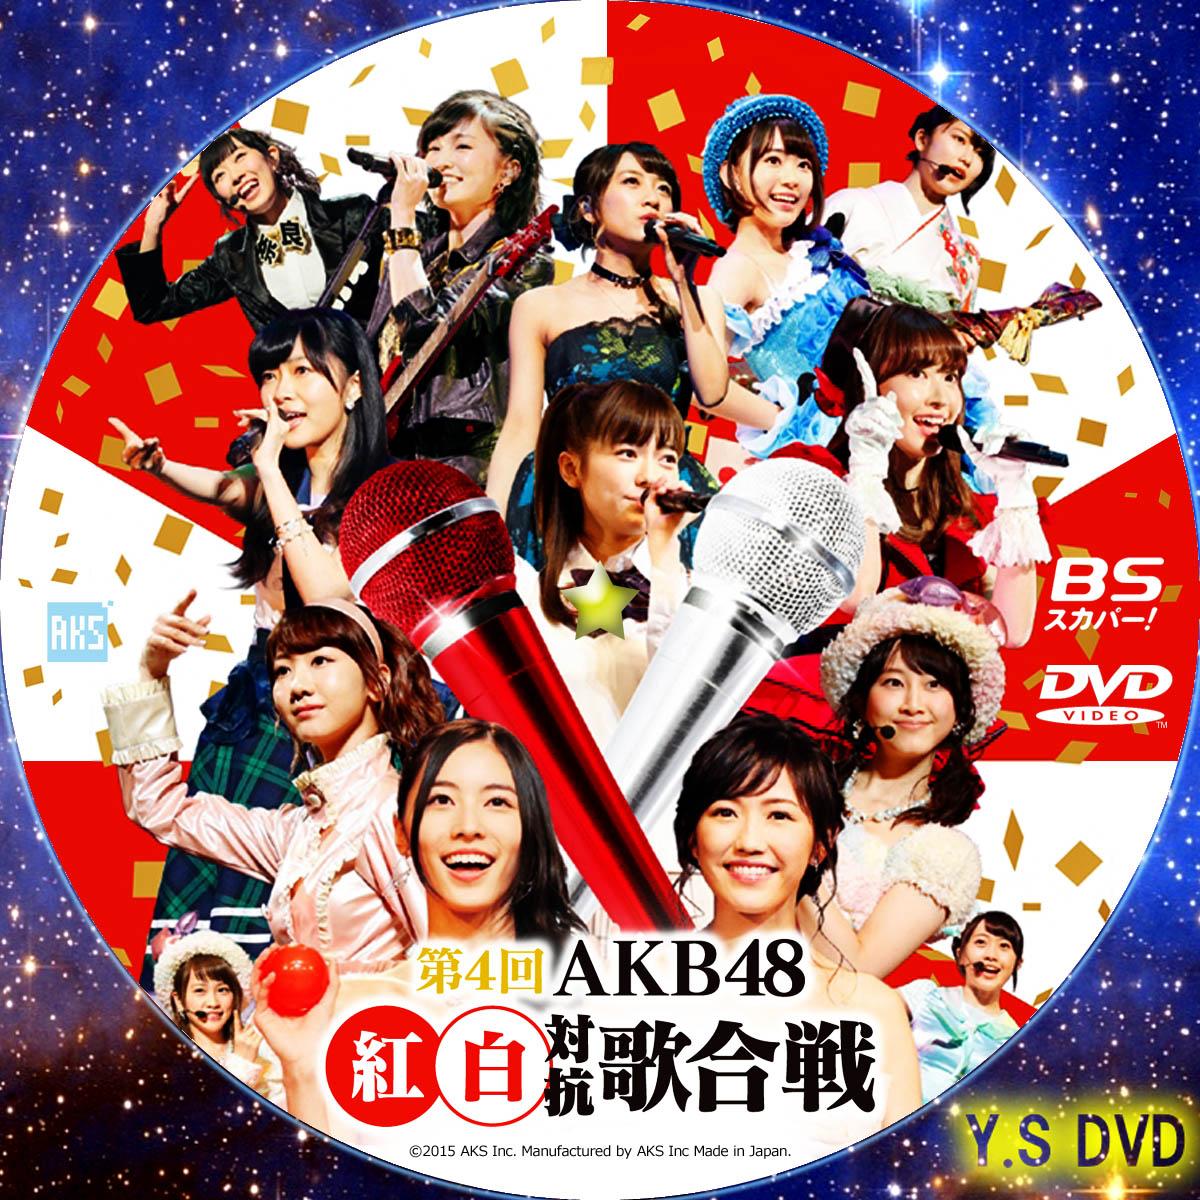 Dvd 返品種別a Akb48 Dvd2枚組 第8回 Akb48紅白対抗歌合戦